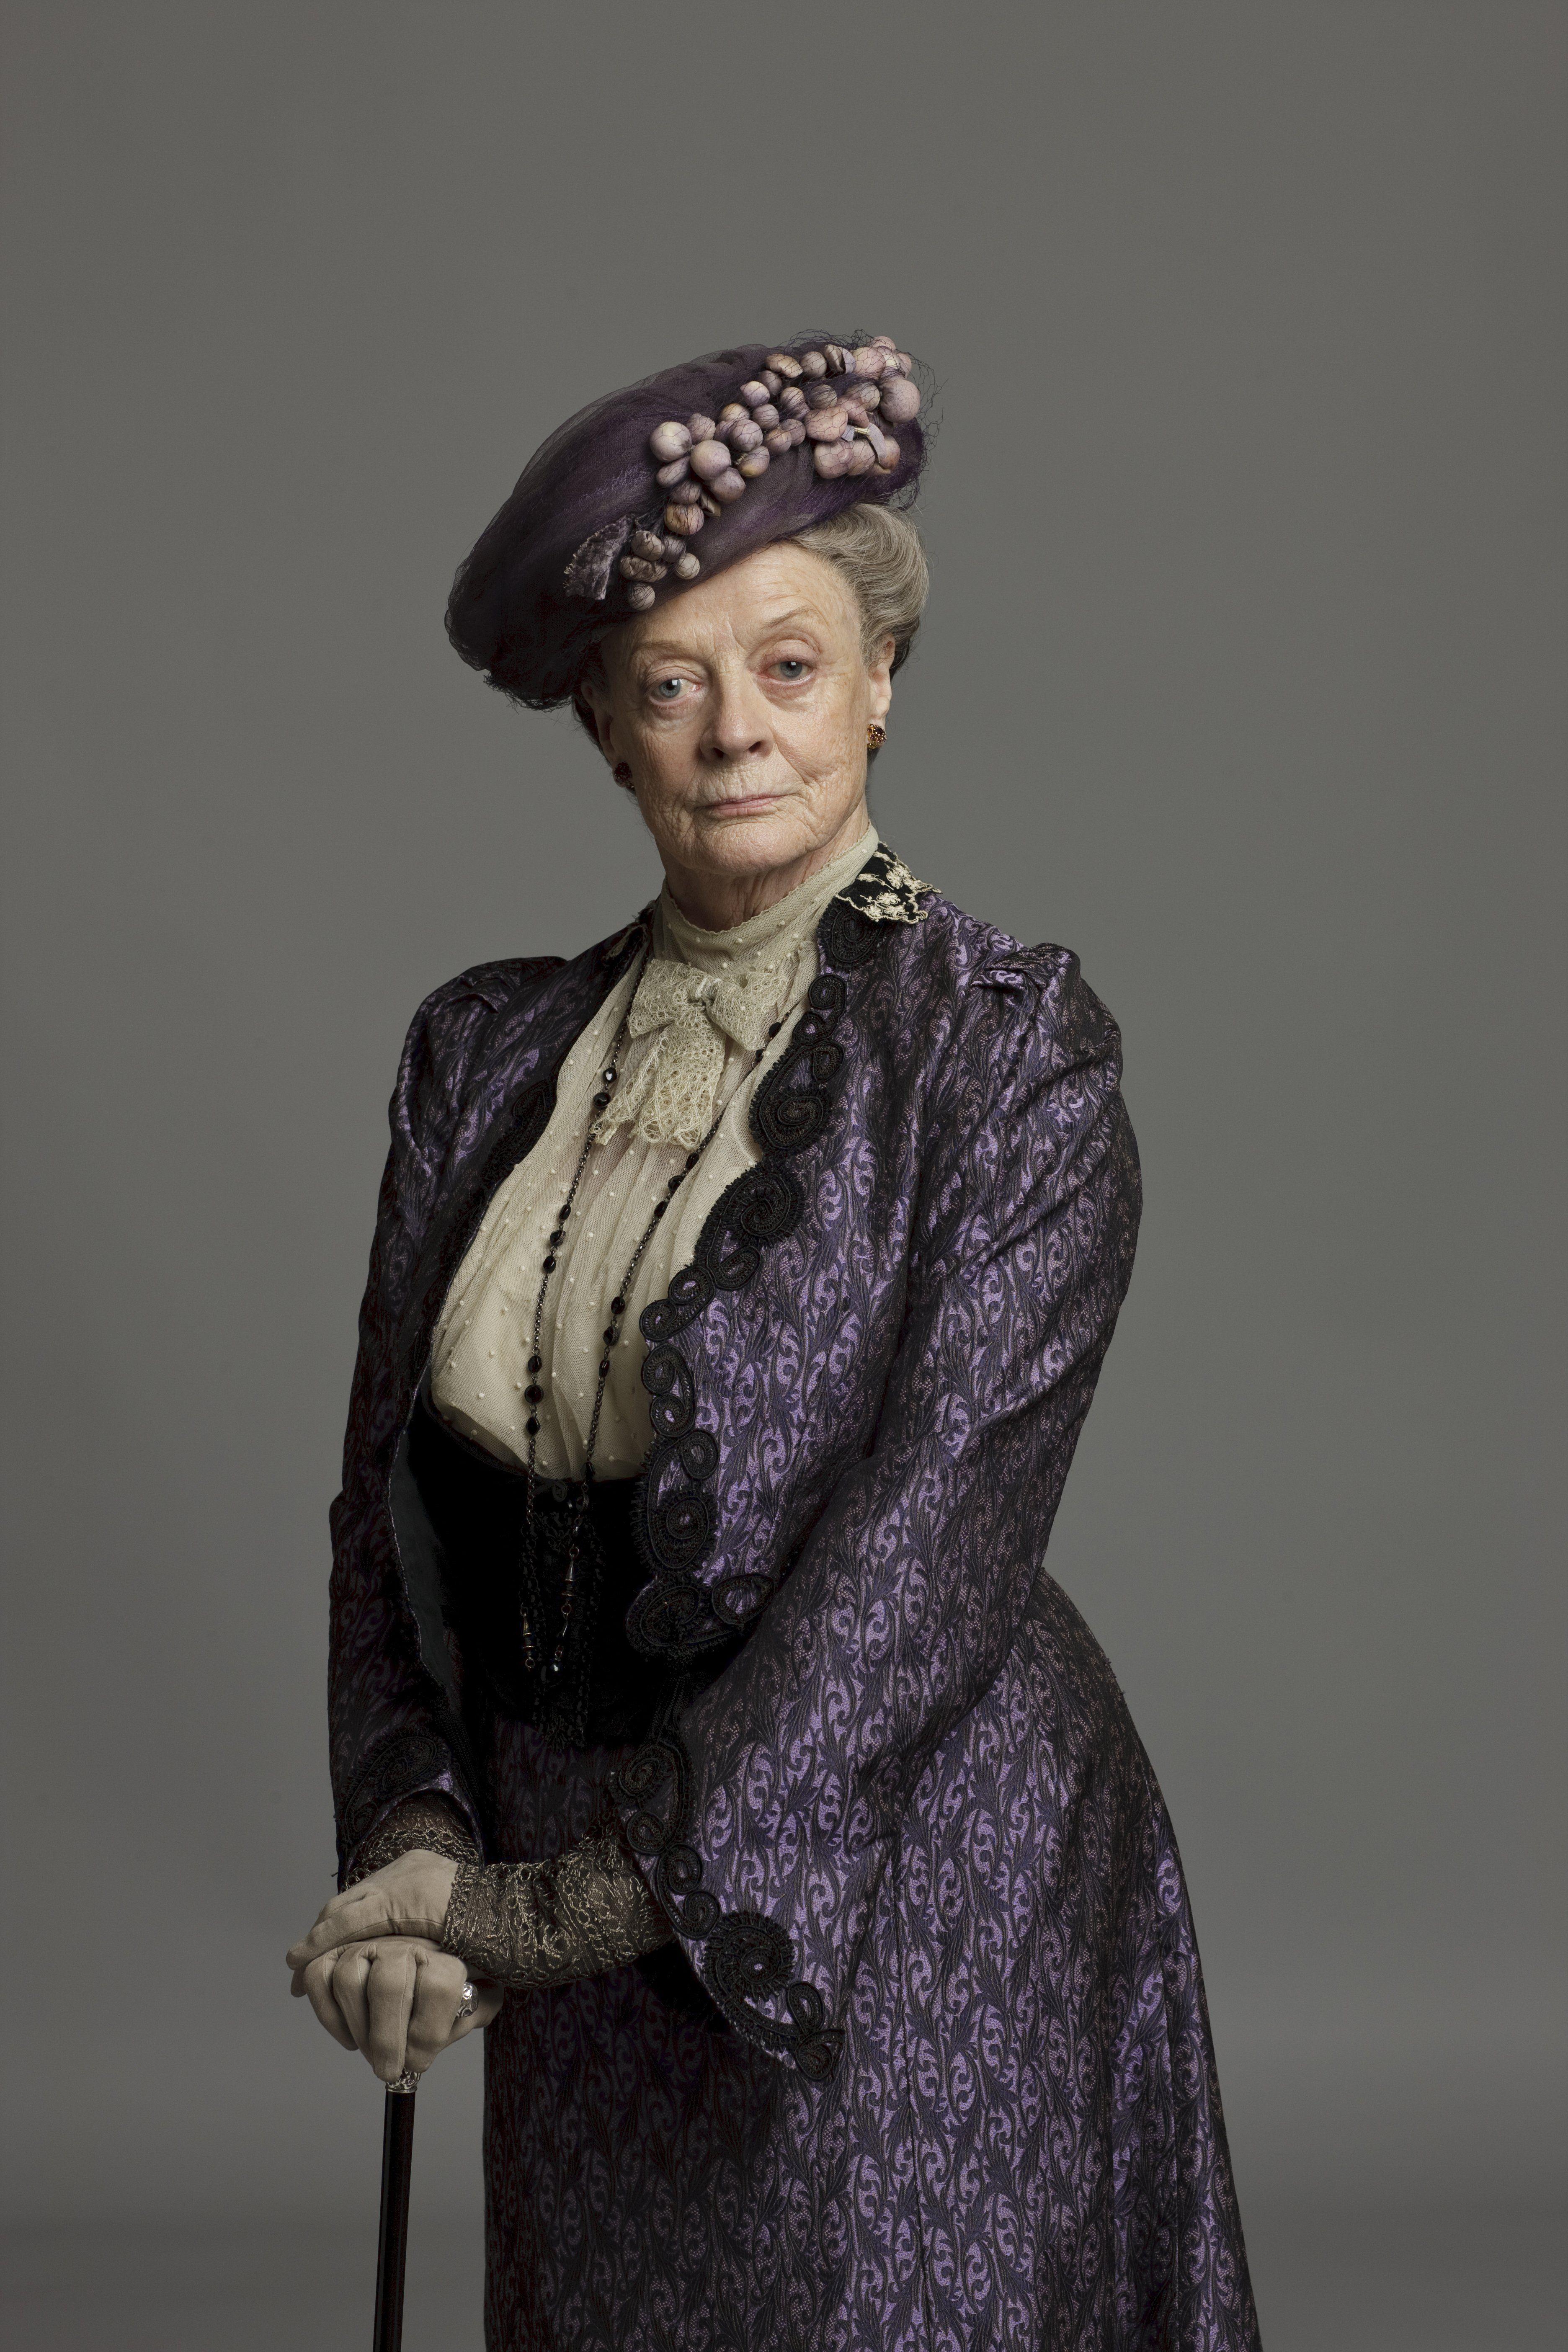 Downton Abbey - Countess Violet Crawley | Downton Abbey Series ...